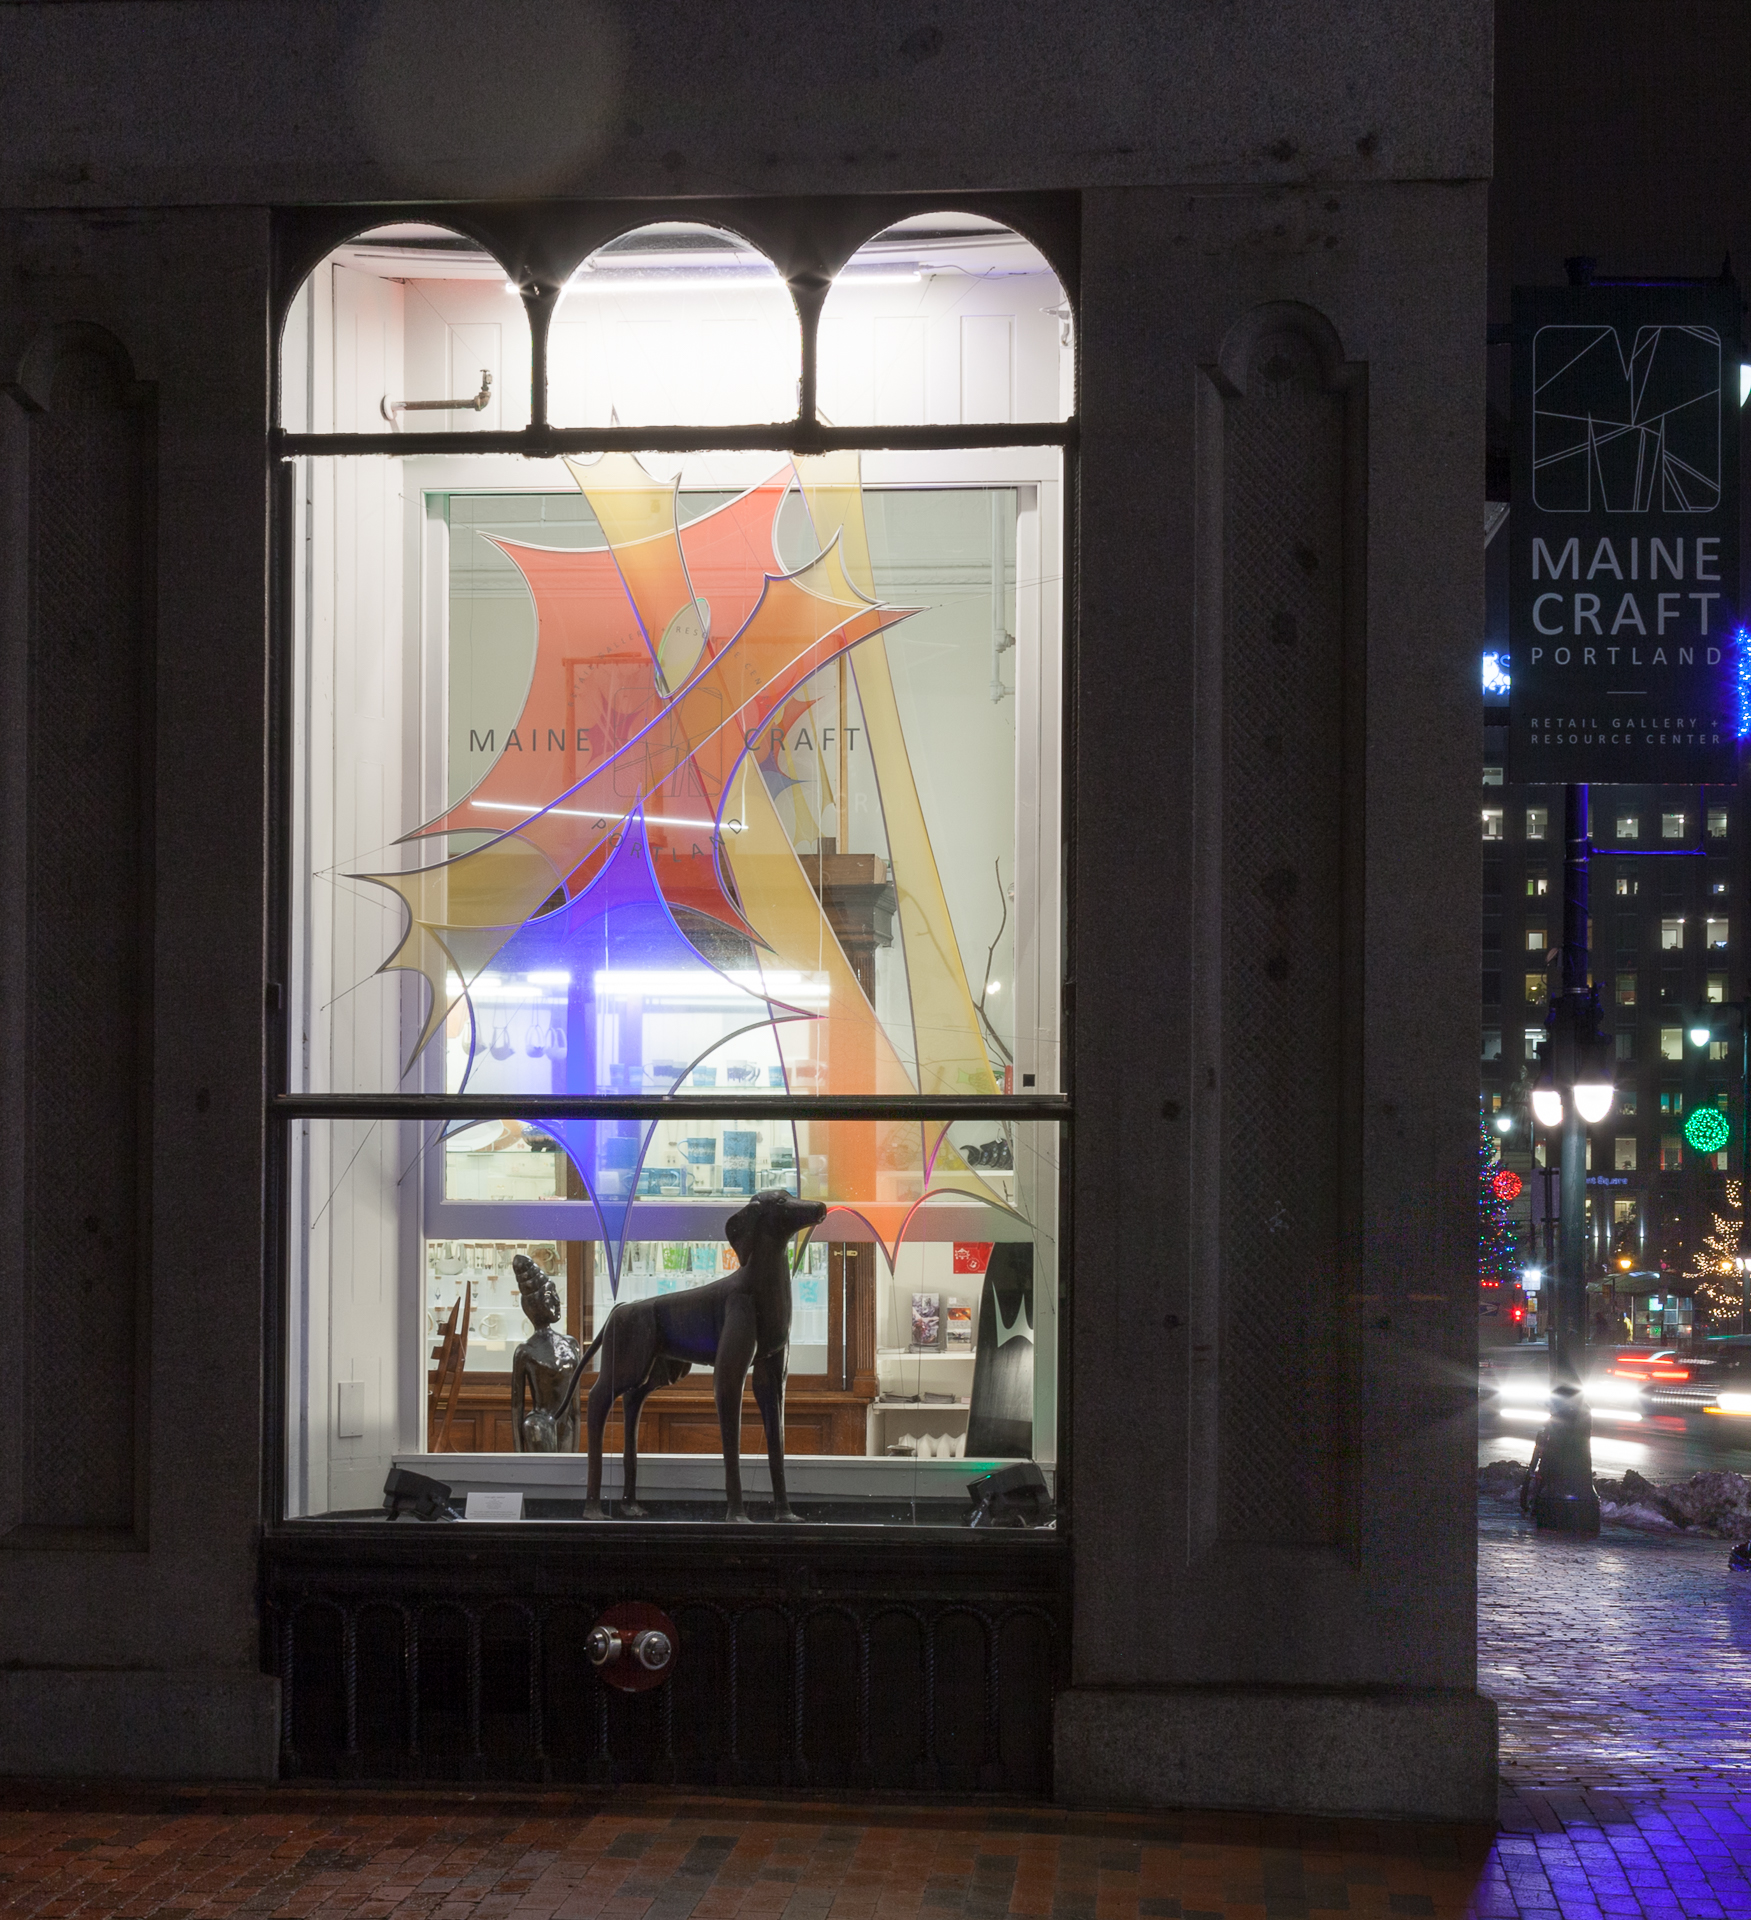 Maine Craft Portland - window 3